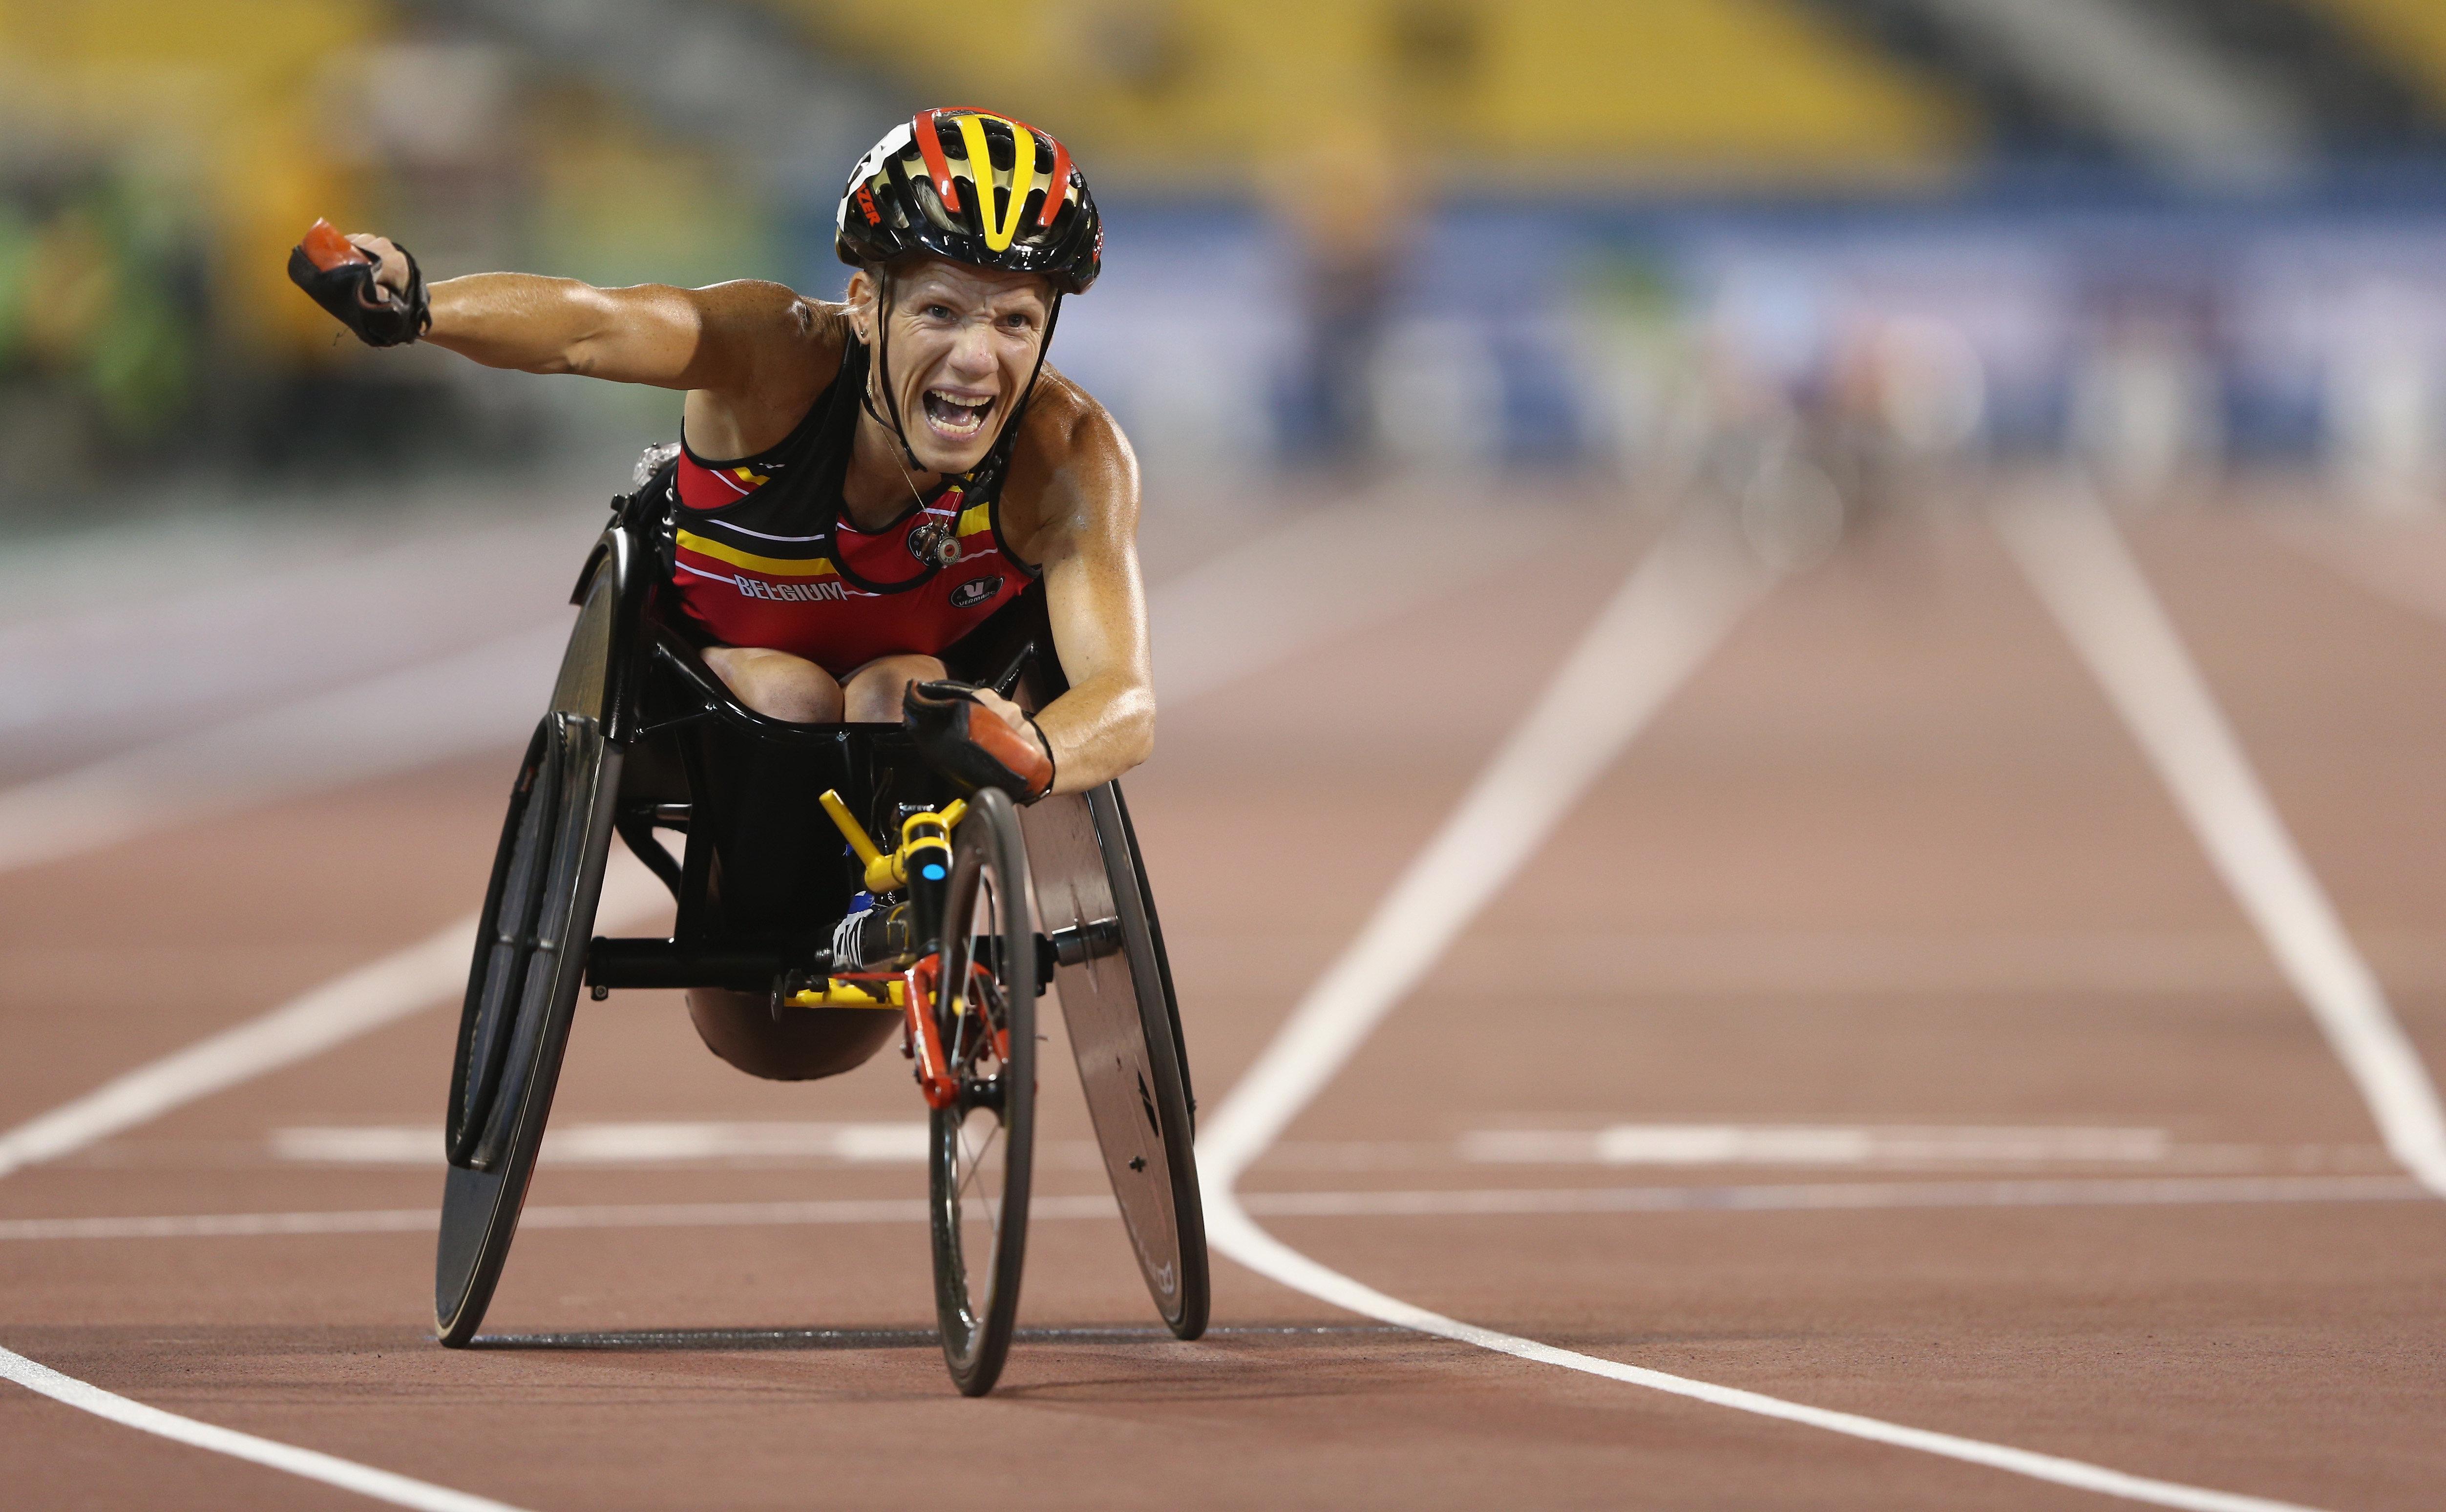 Marieke Vervoort of Belgium celebrates winning the women's 200m T52 final duringthe IPC Athletics World Championships i